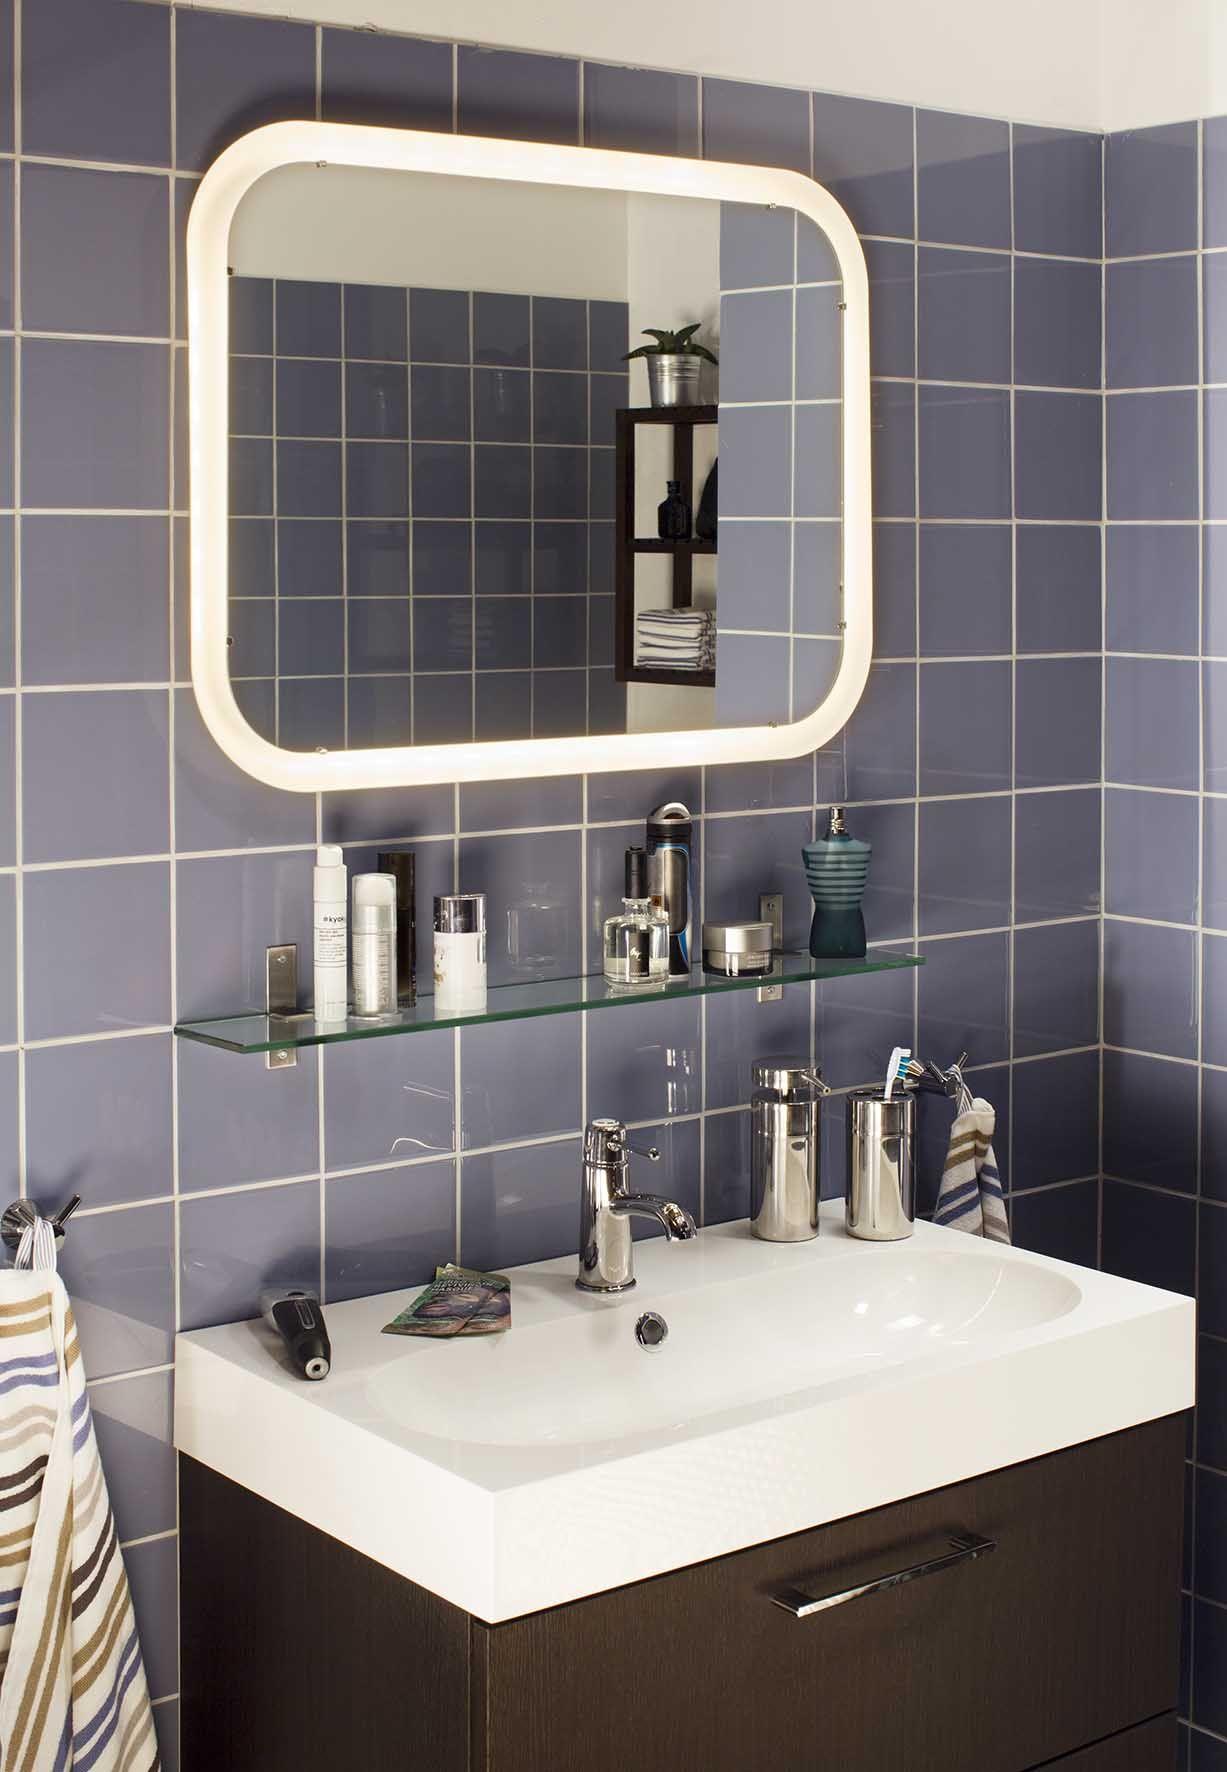 Storjorm spiegel m ge ntegreerde verlichting wit toilet bath room and bath - Spiegel badkamer geintegreerde verlichting ...